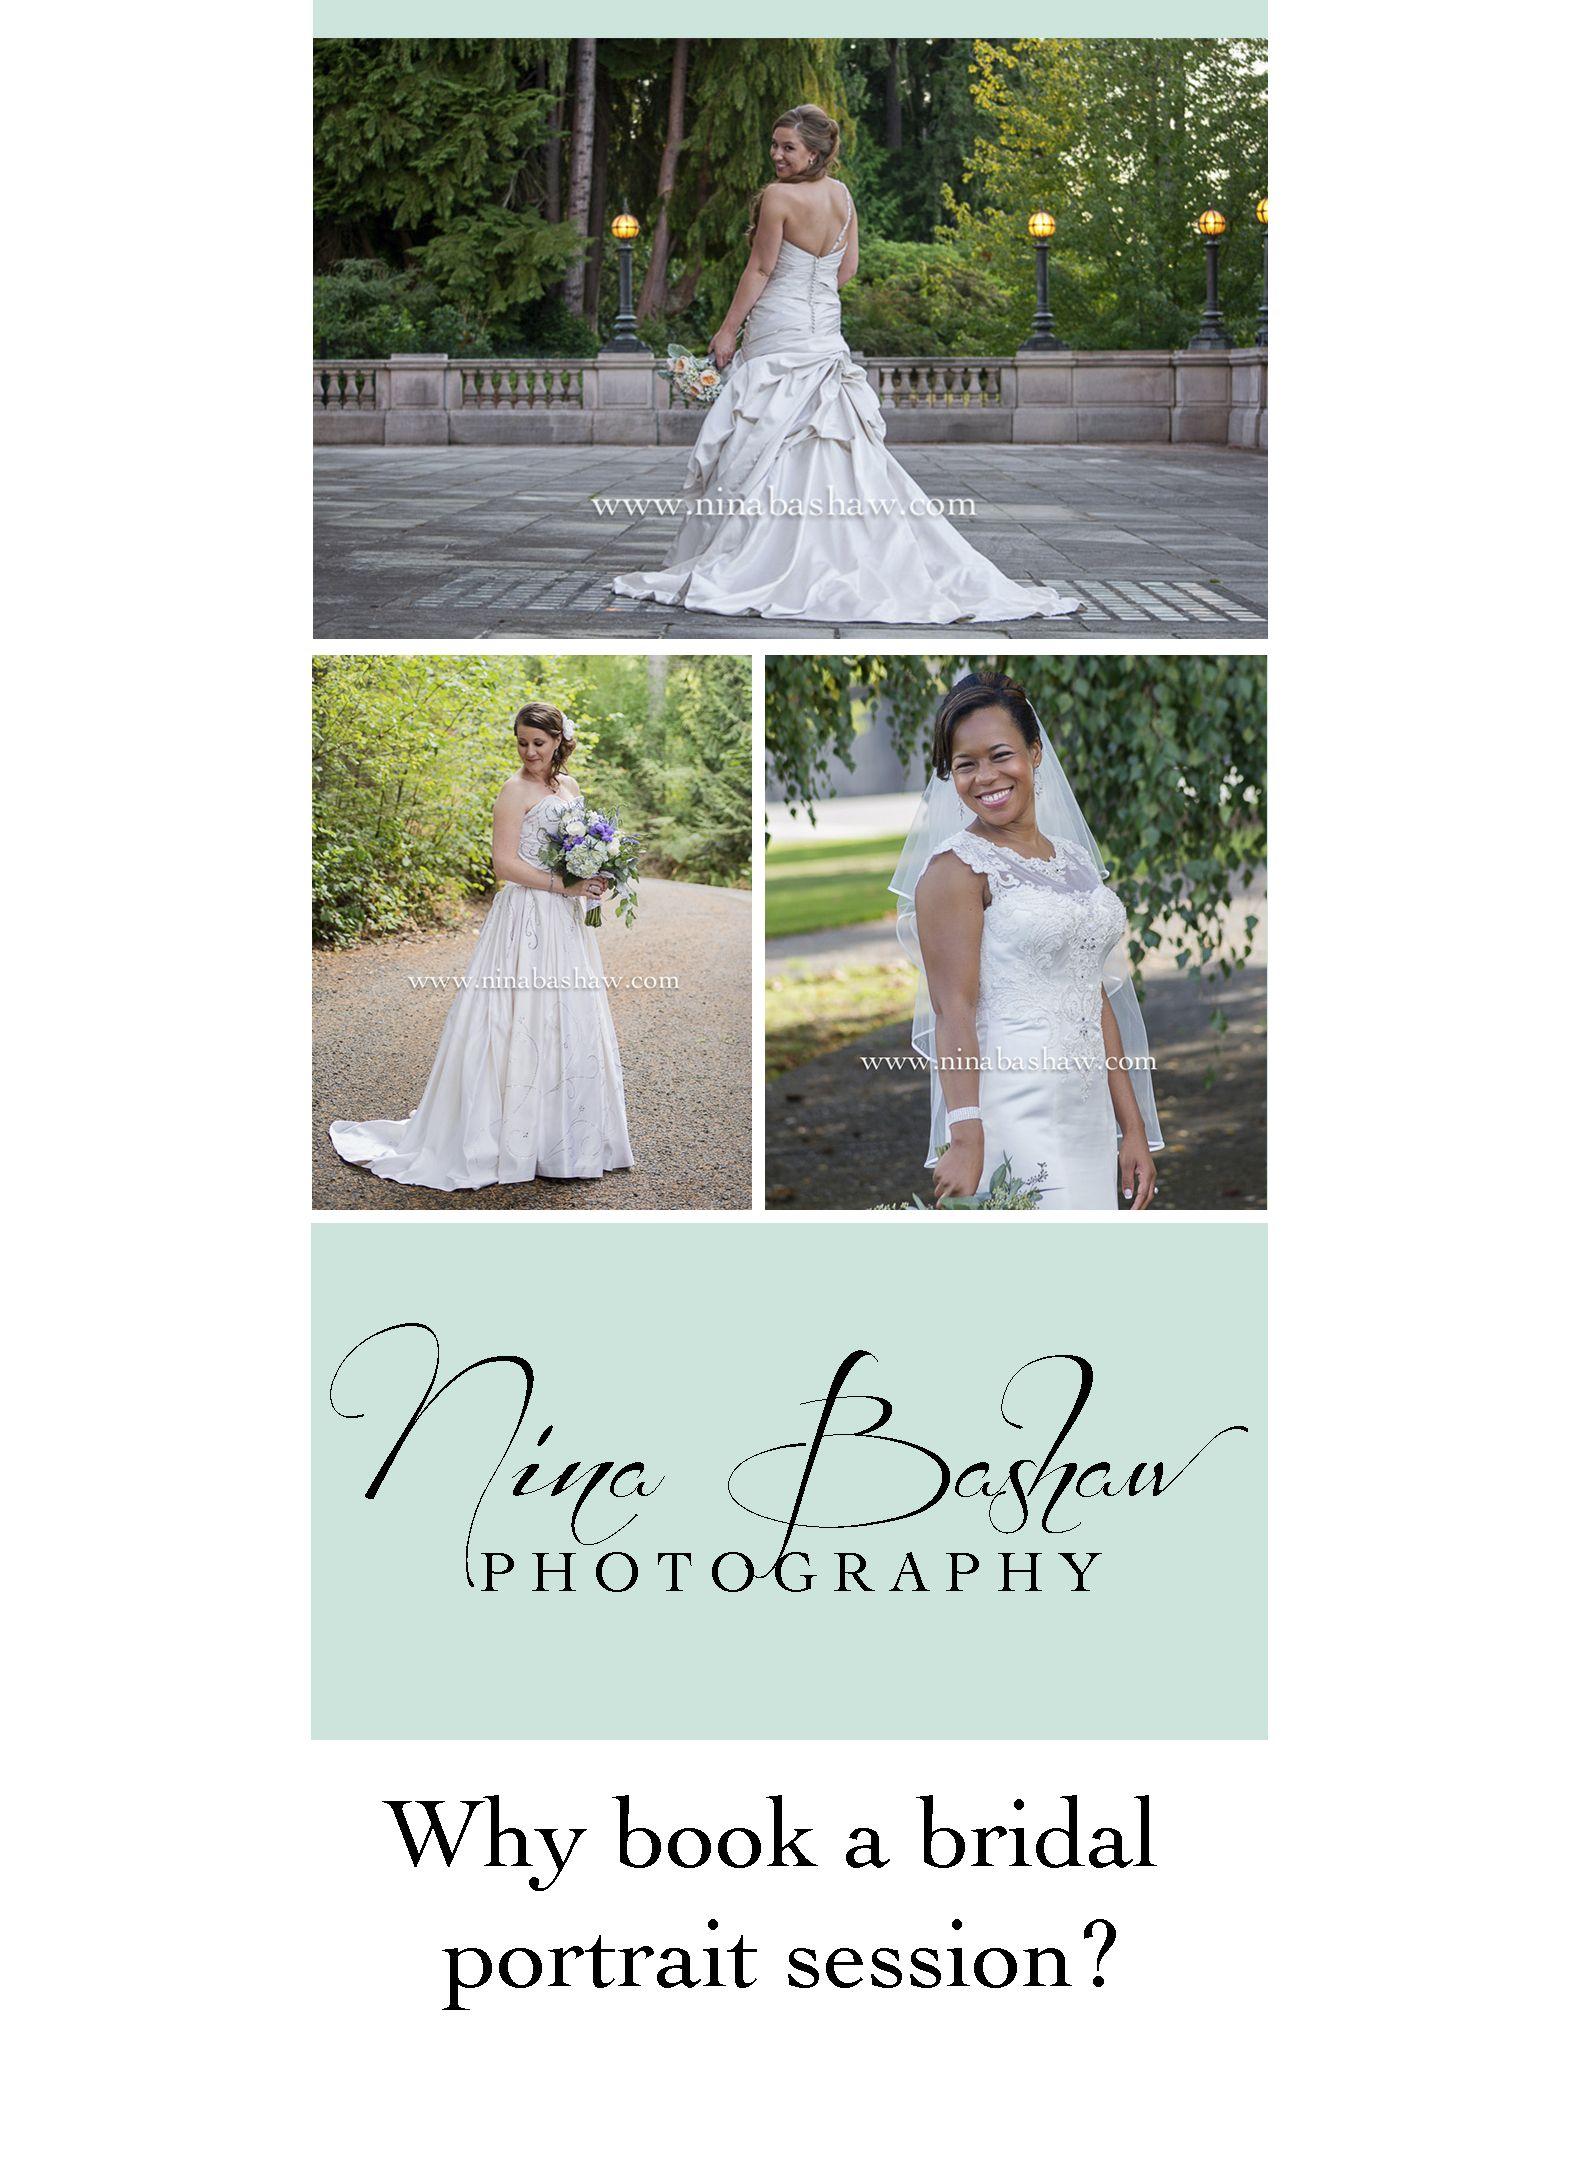 Why book a bridal session nina bashaw photography olympia wa